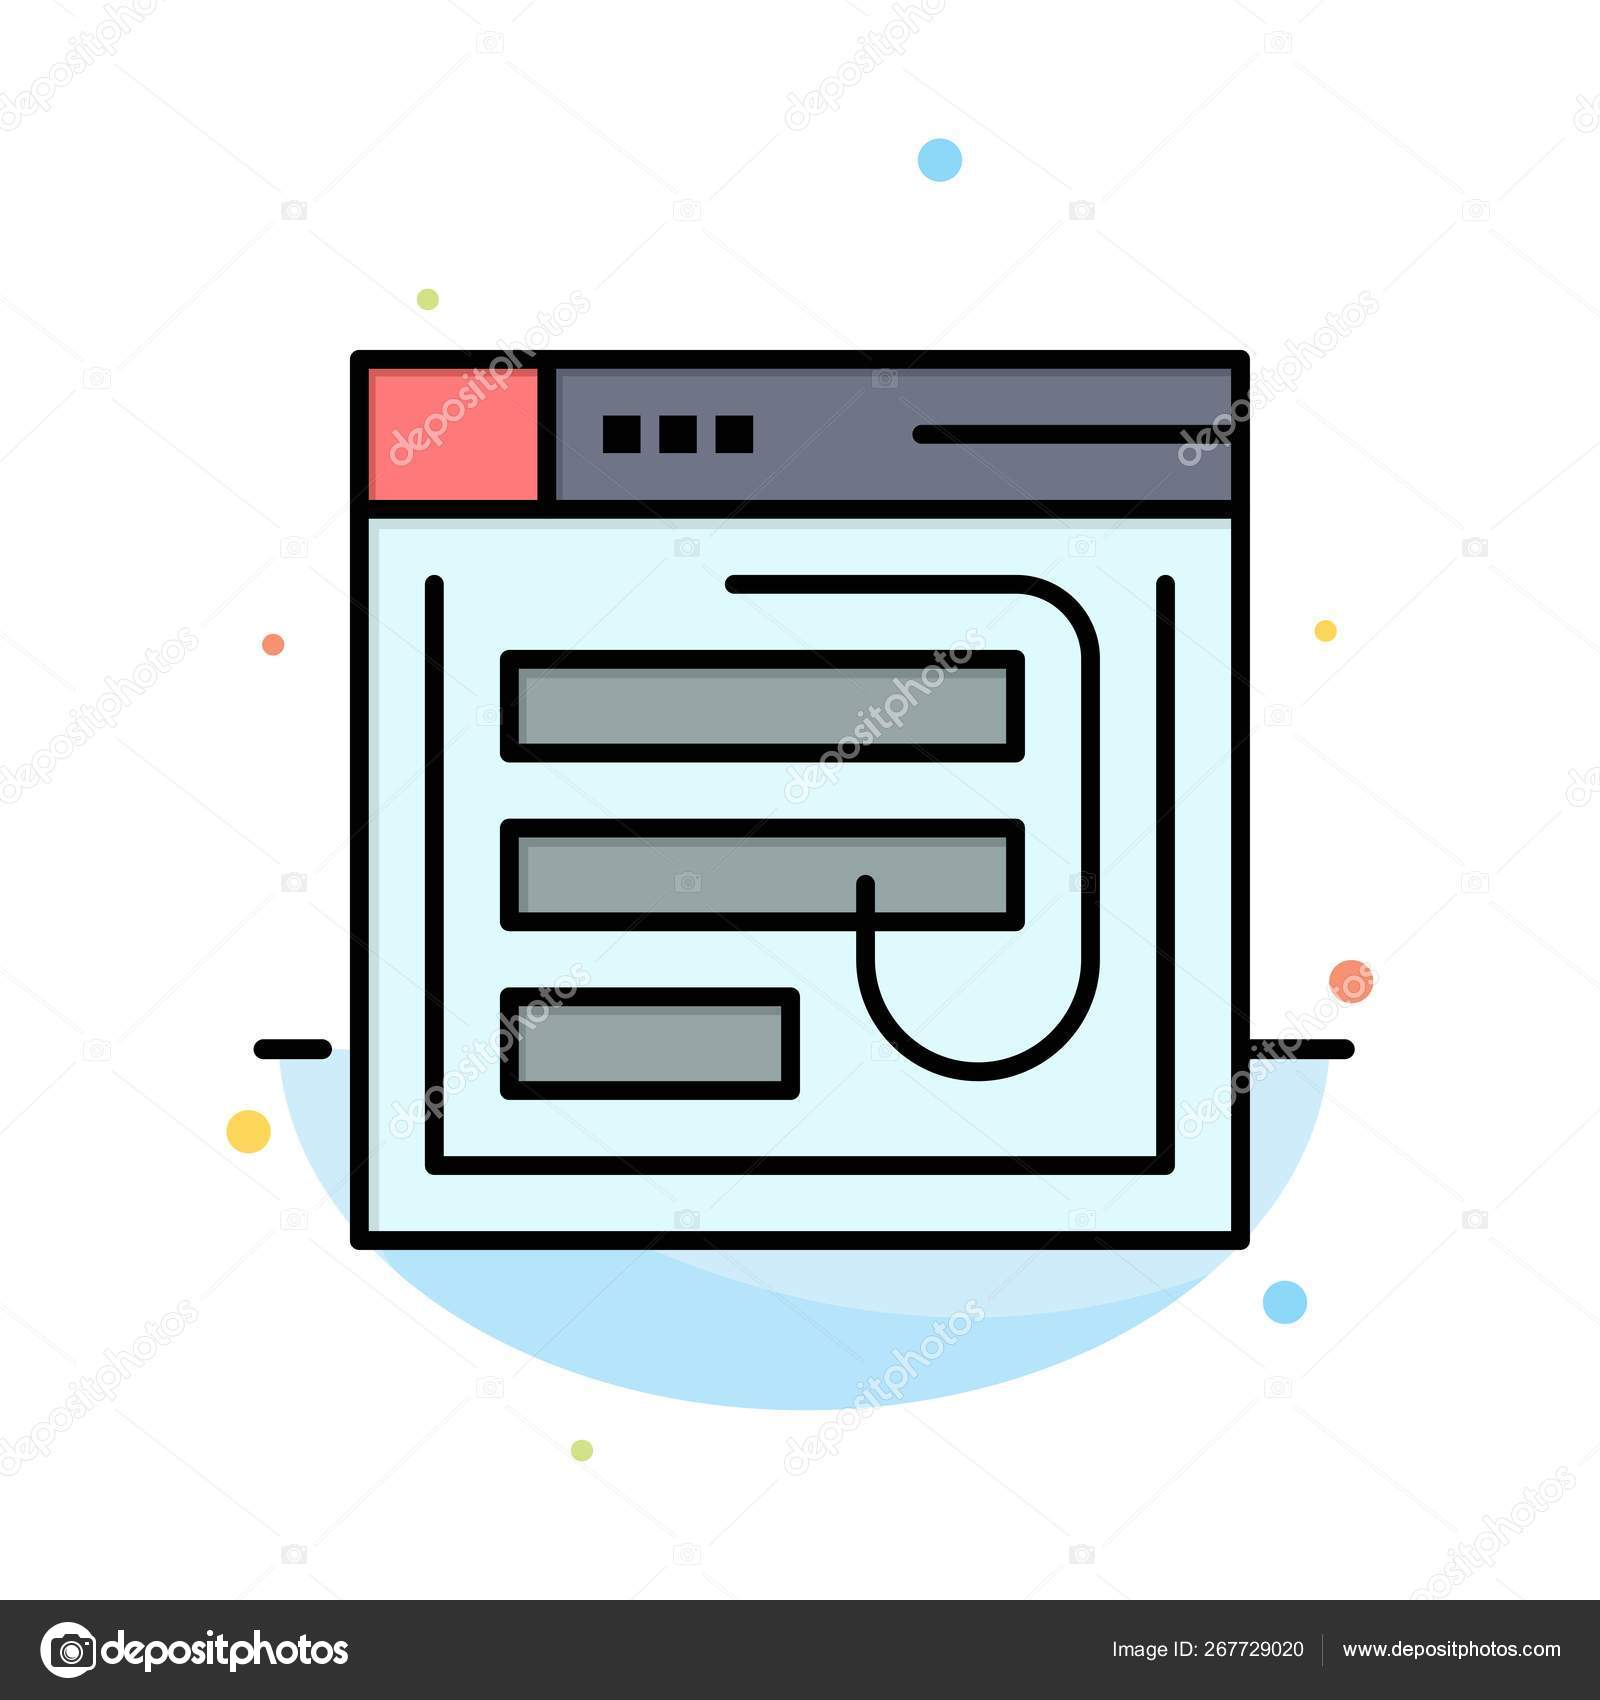 Email, Hack, Internet, Password, Phishing, Web, Website